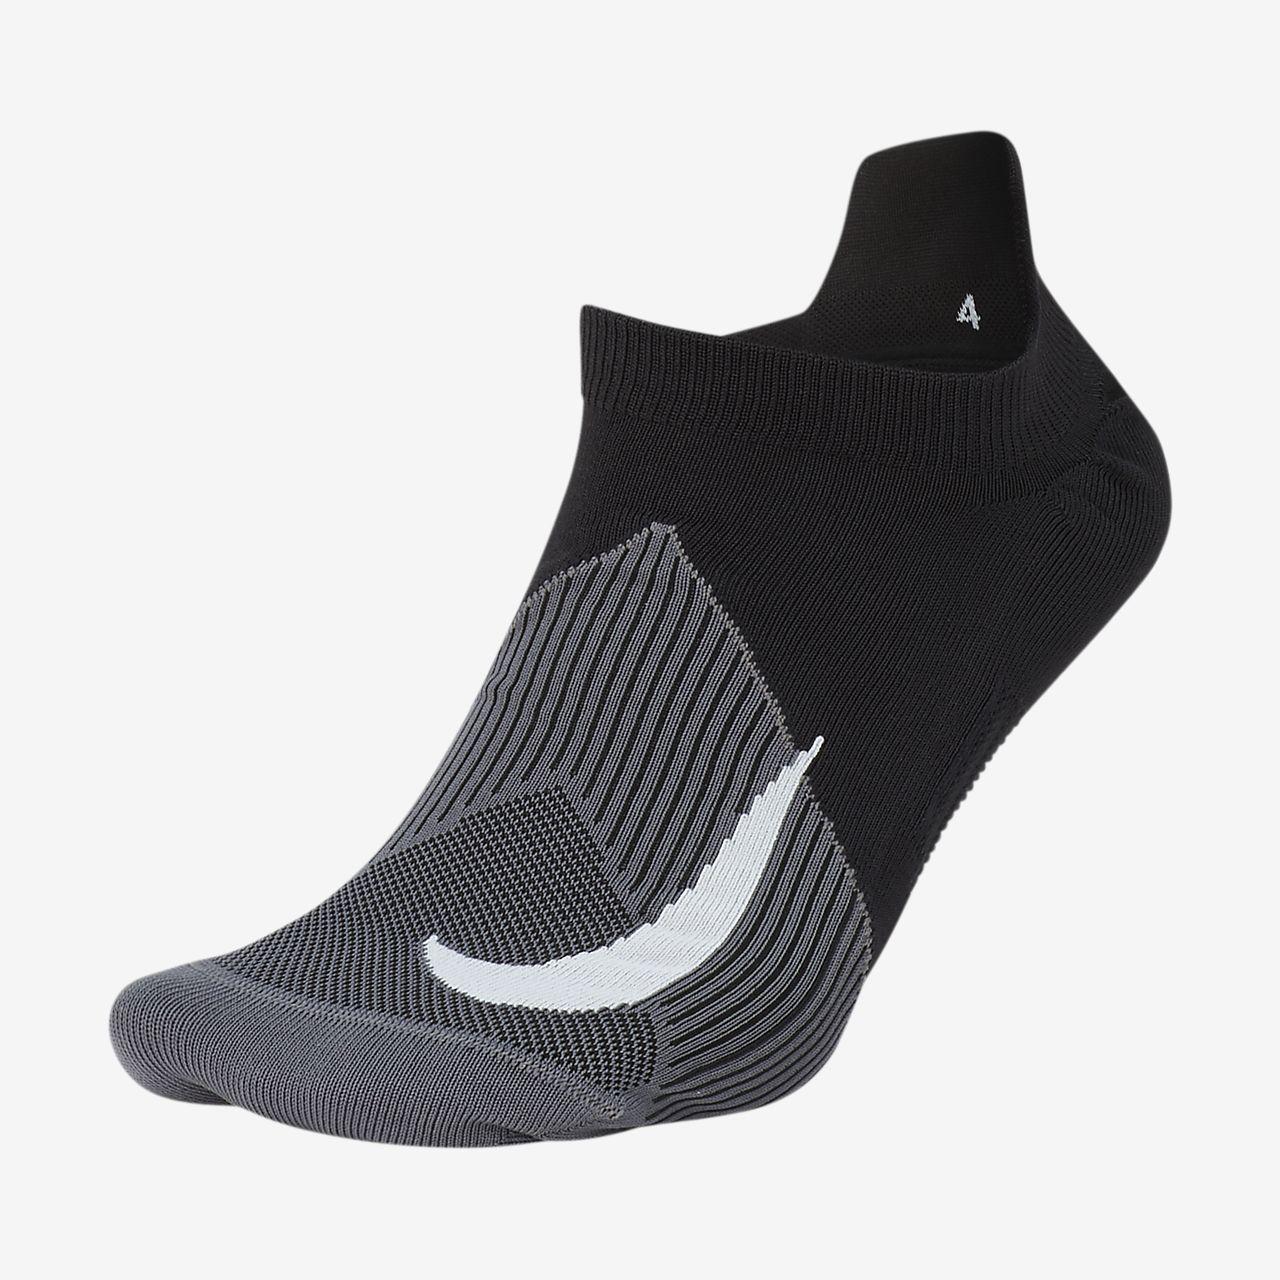 Chaussettes Feetures Elite Light Cushion No Show Tab Femme